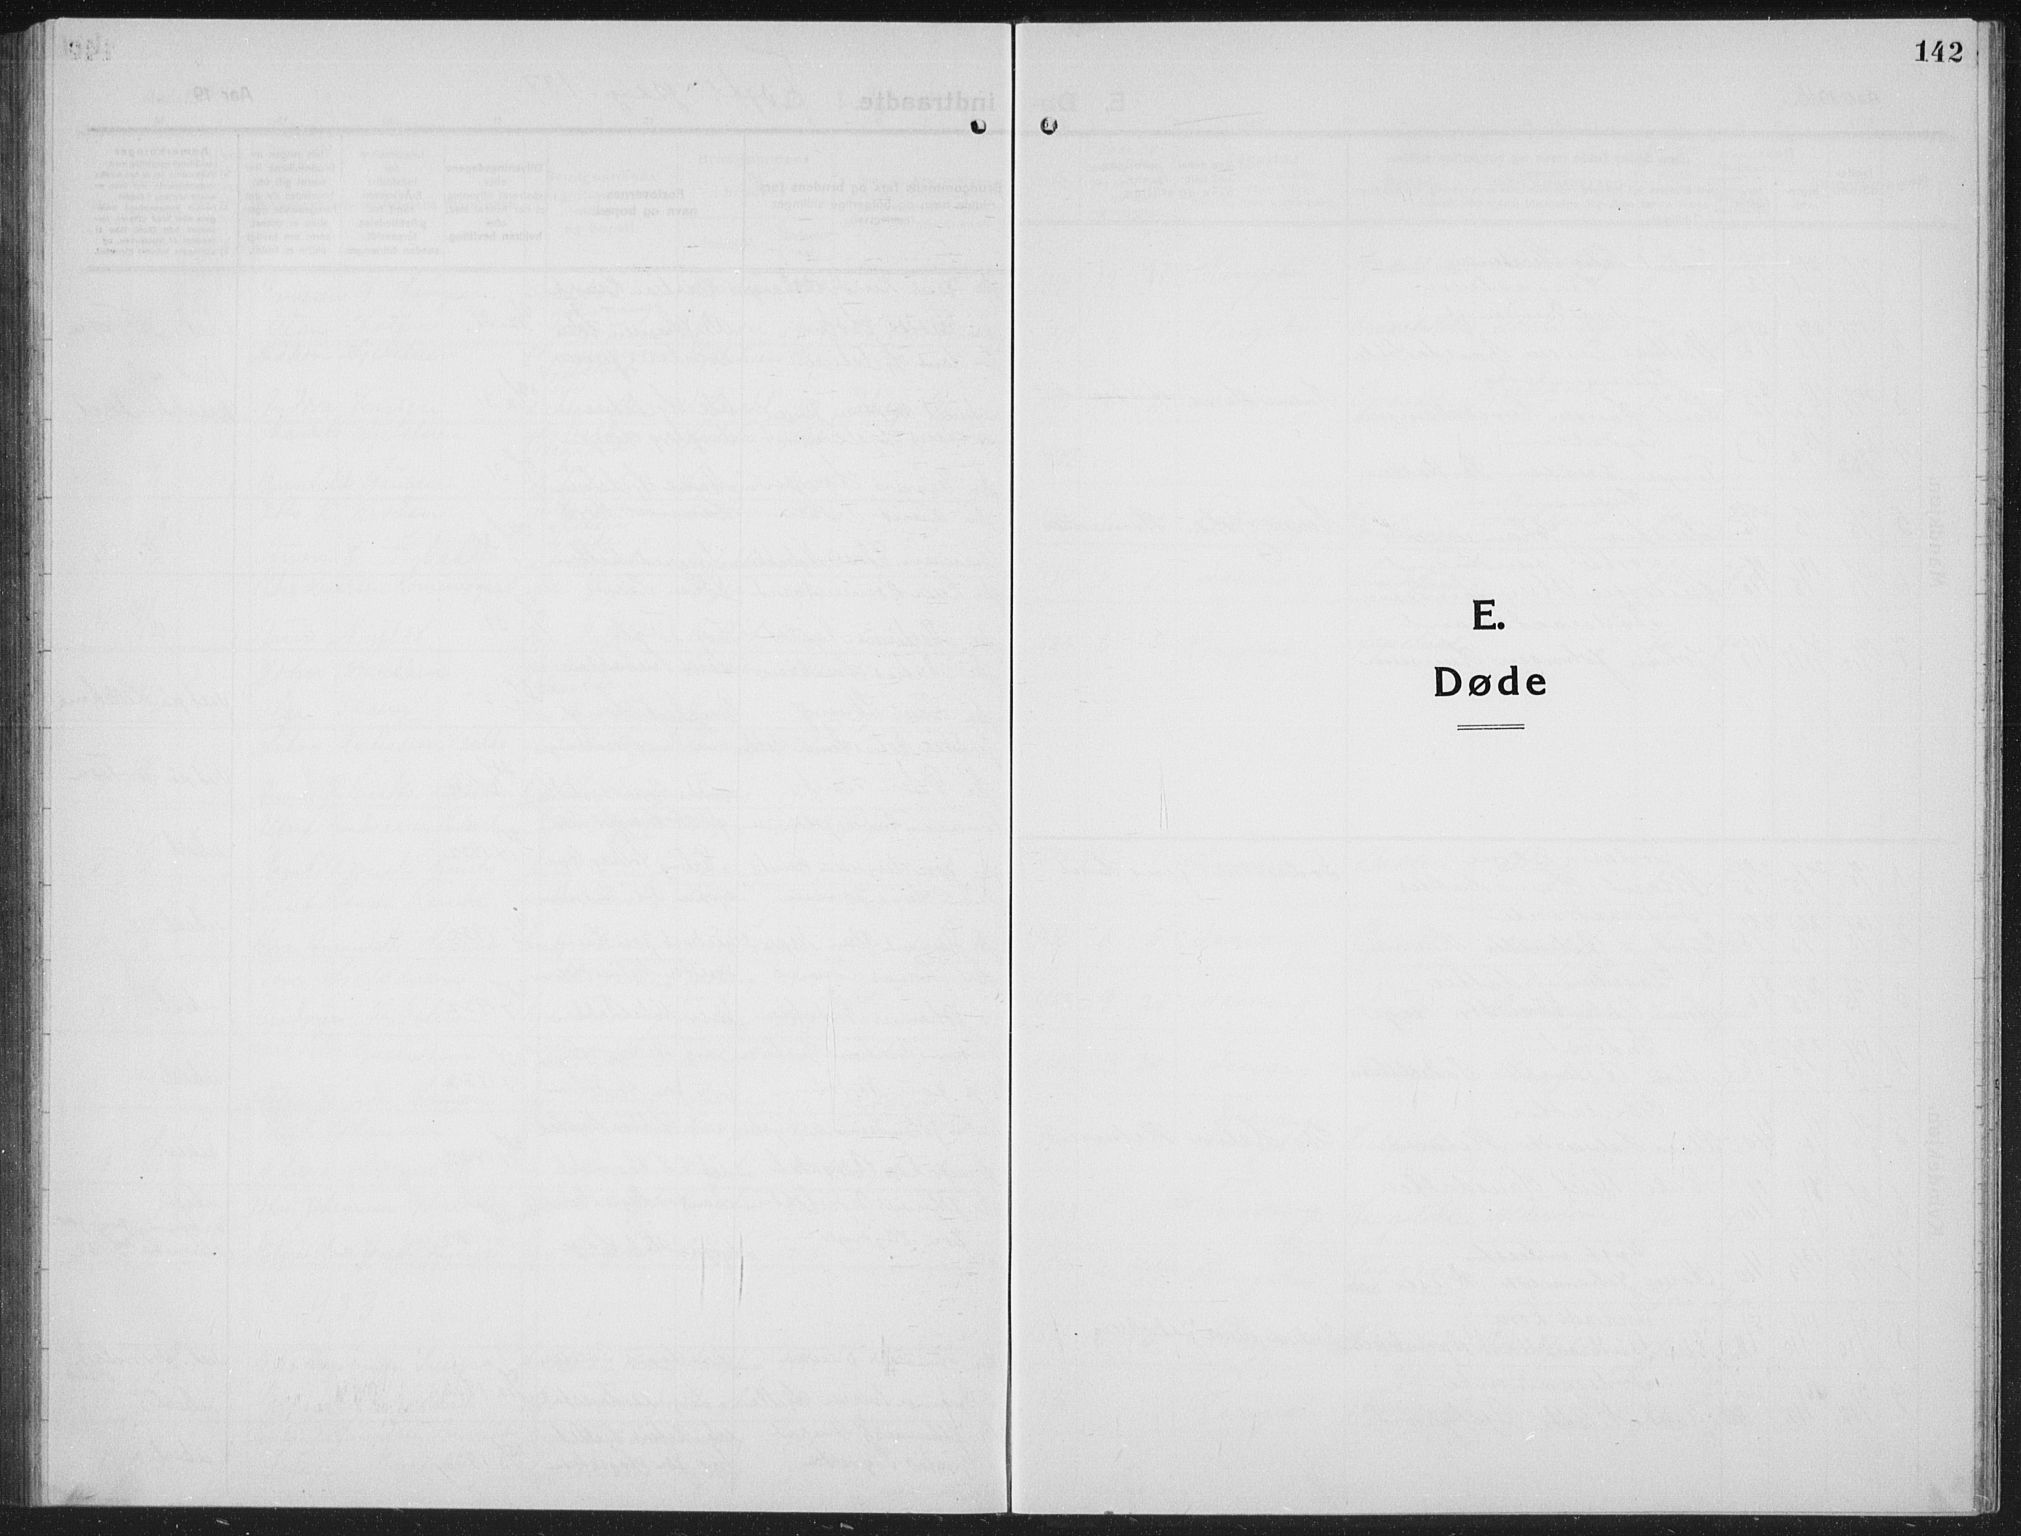 SAH, Ringebu prestekontor, Klokkerbok nr. 10, 1911-1934, s. 142